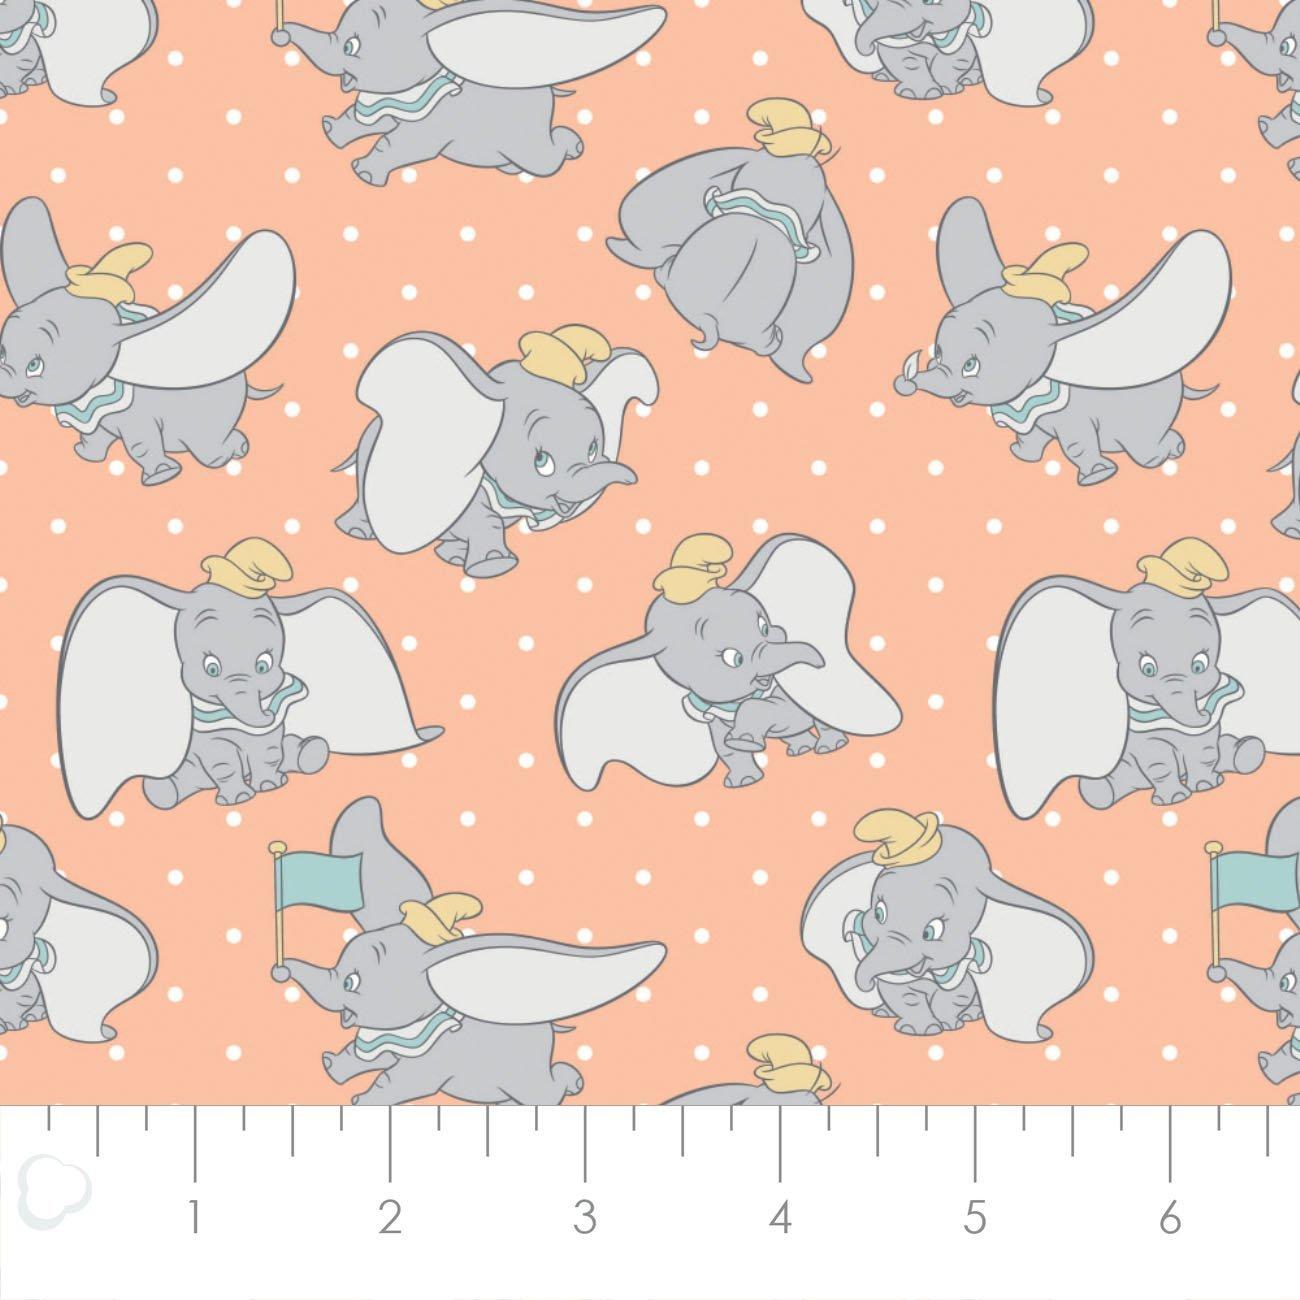 Disney Dumbo My little Circus 85160305-01 Poses Peach